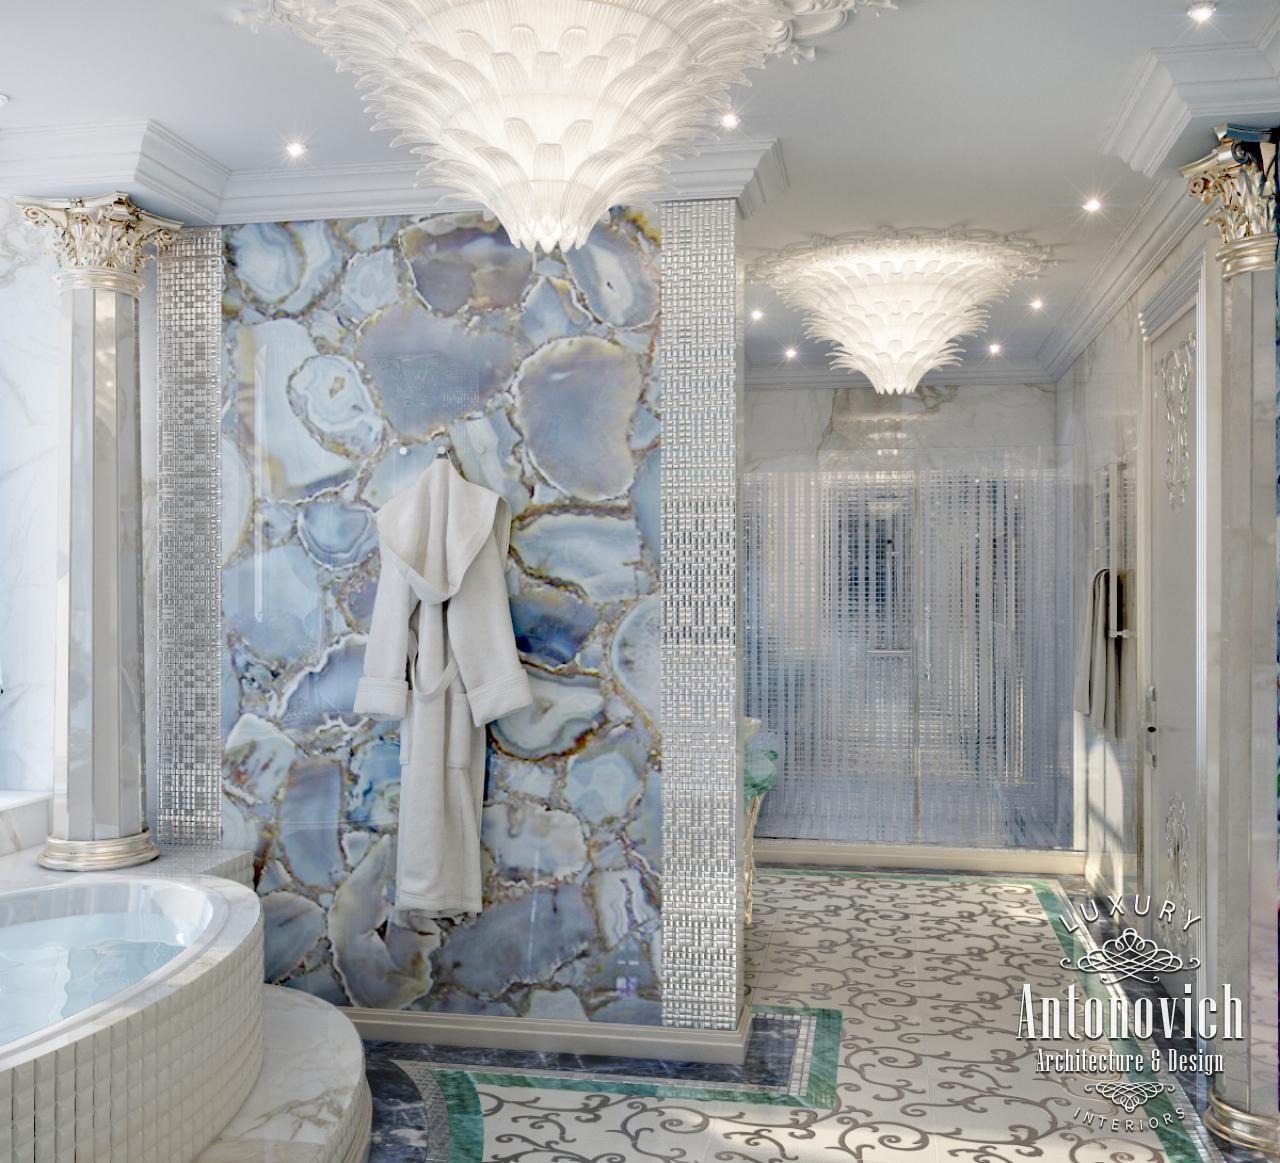 Bathroom Designs Dubai bathroom design in dubai, luxury bathroom abu dhabi, photo 1